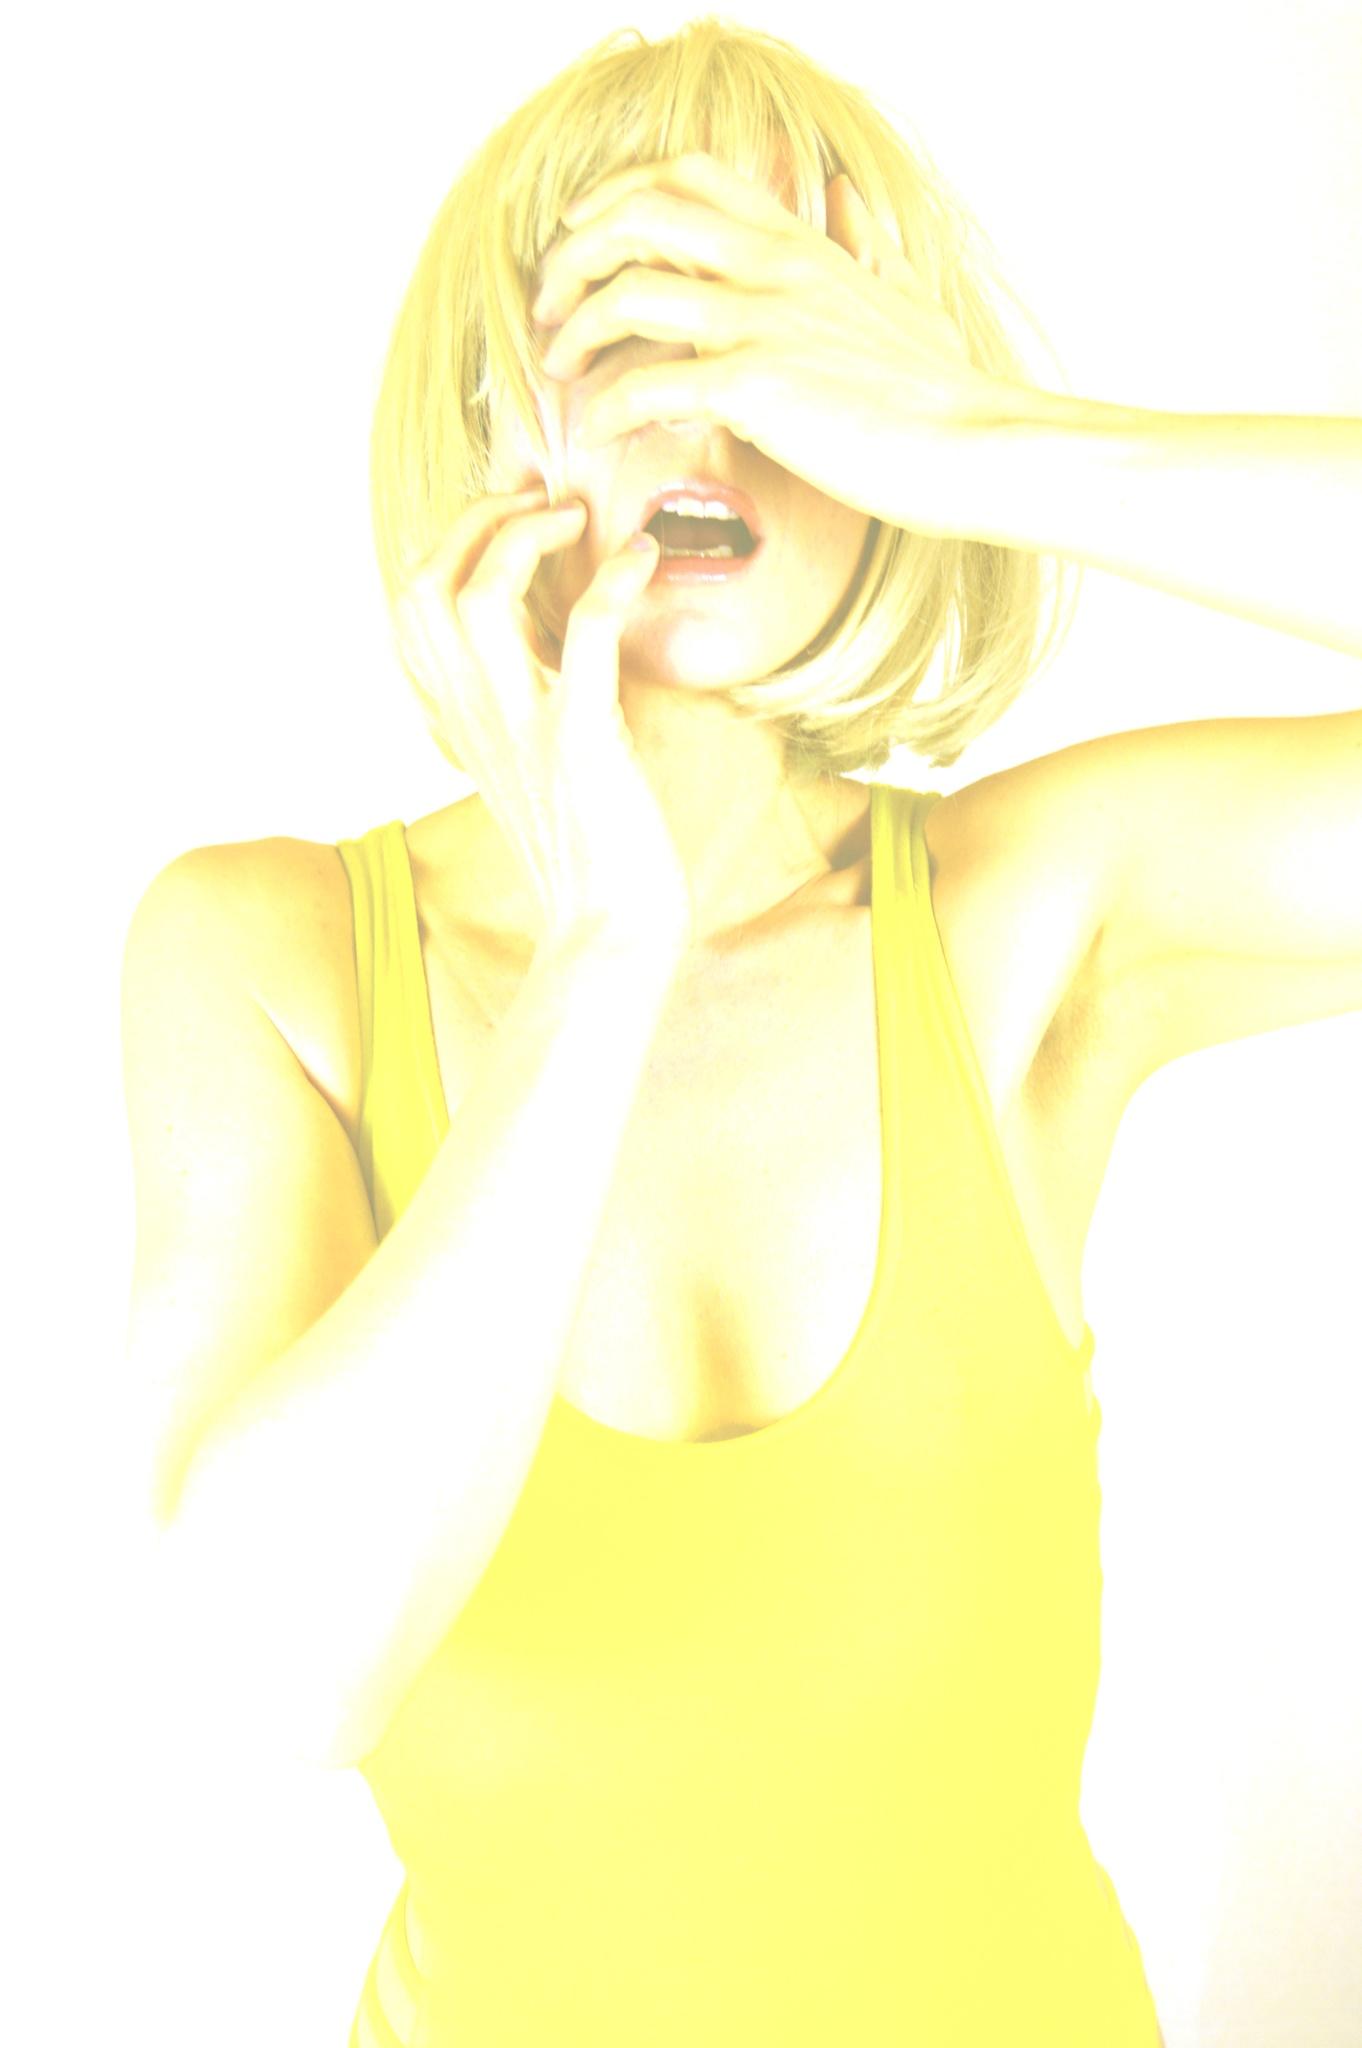 Portrait in yellow by John White